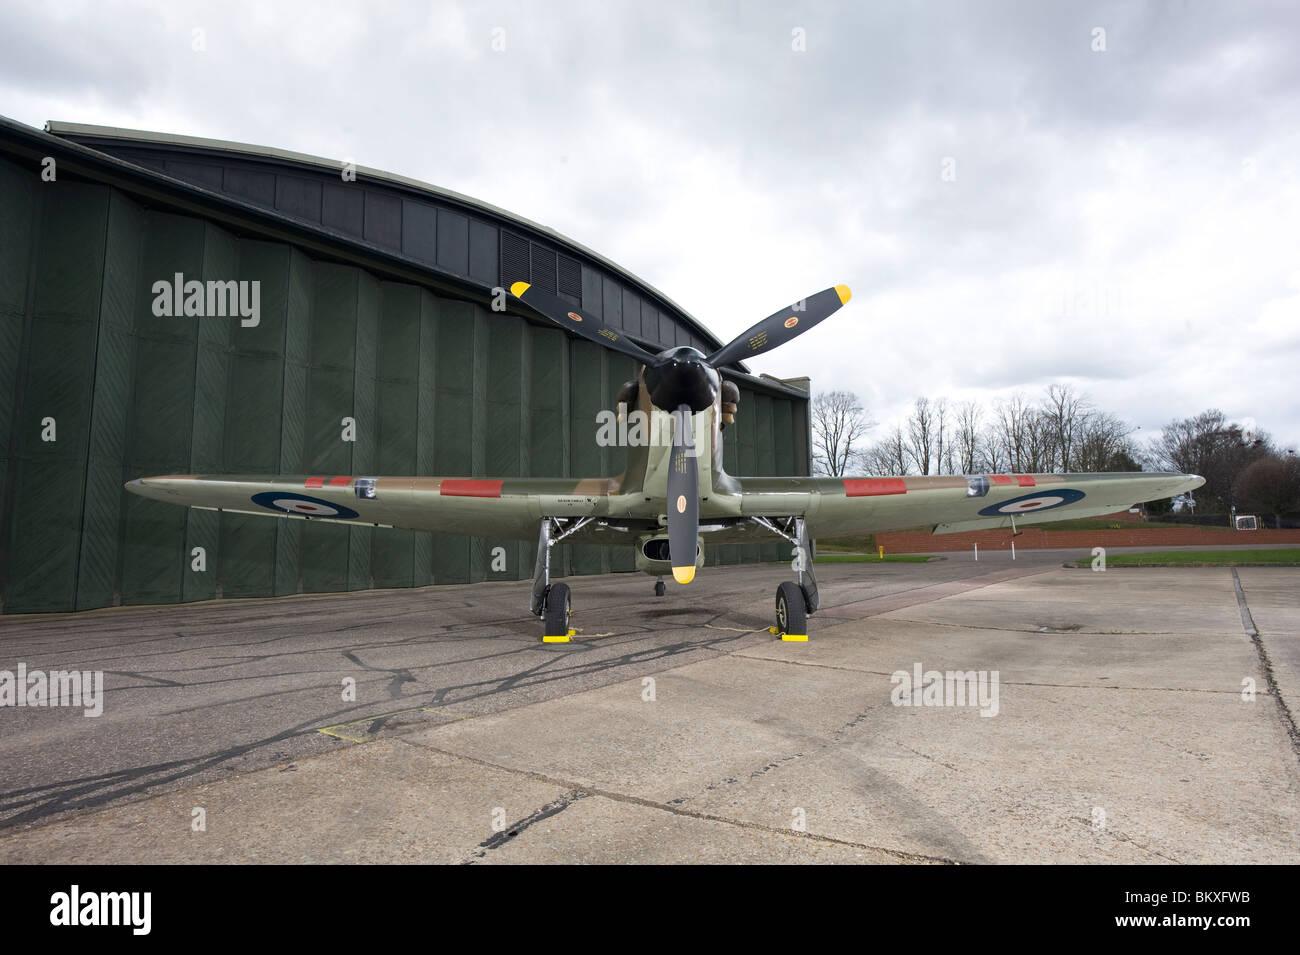 Hawker Hurricane British World War 2 fighter plane - Stock Image